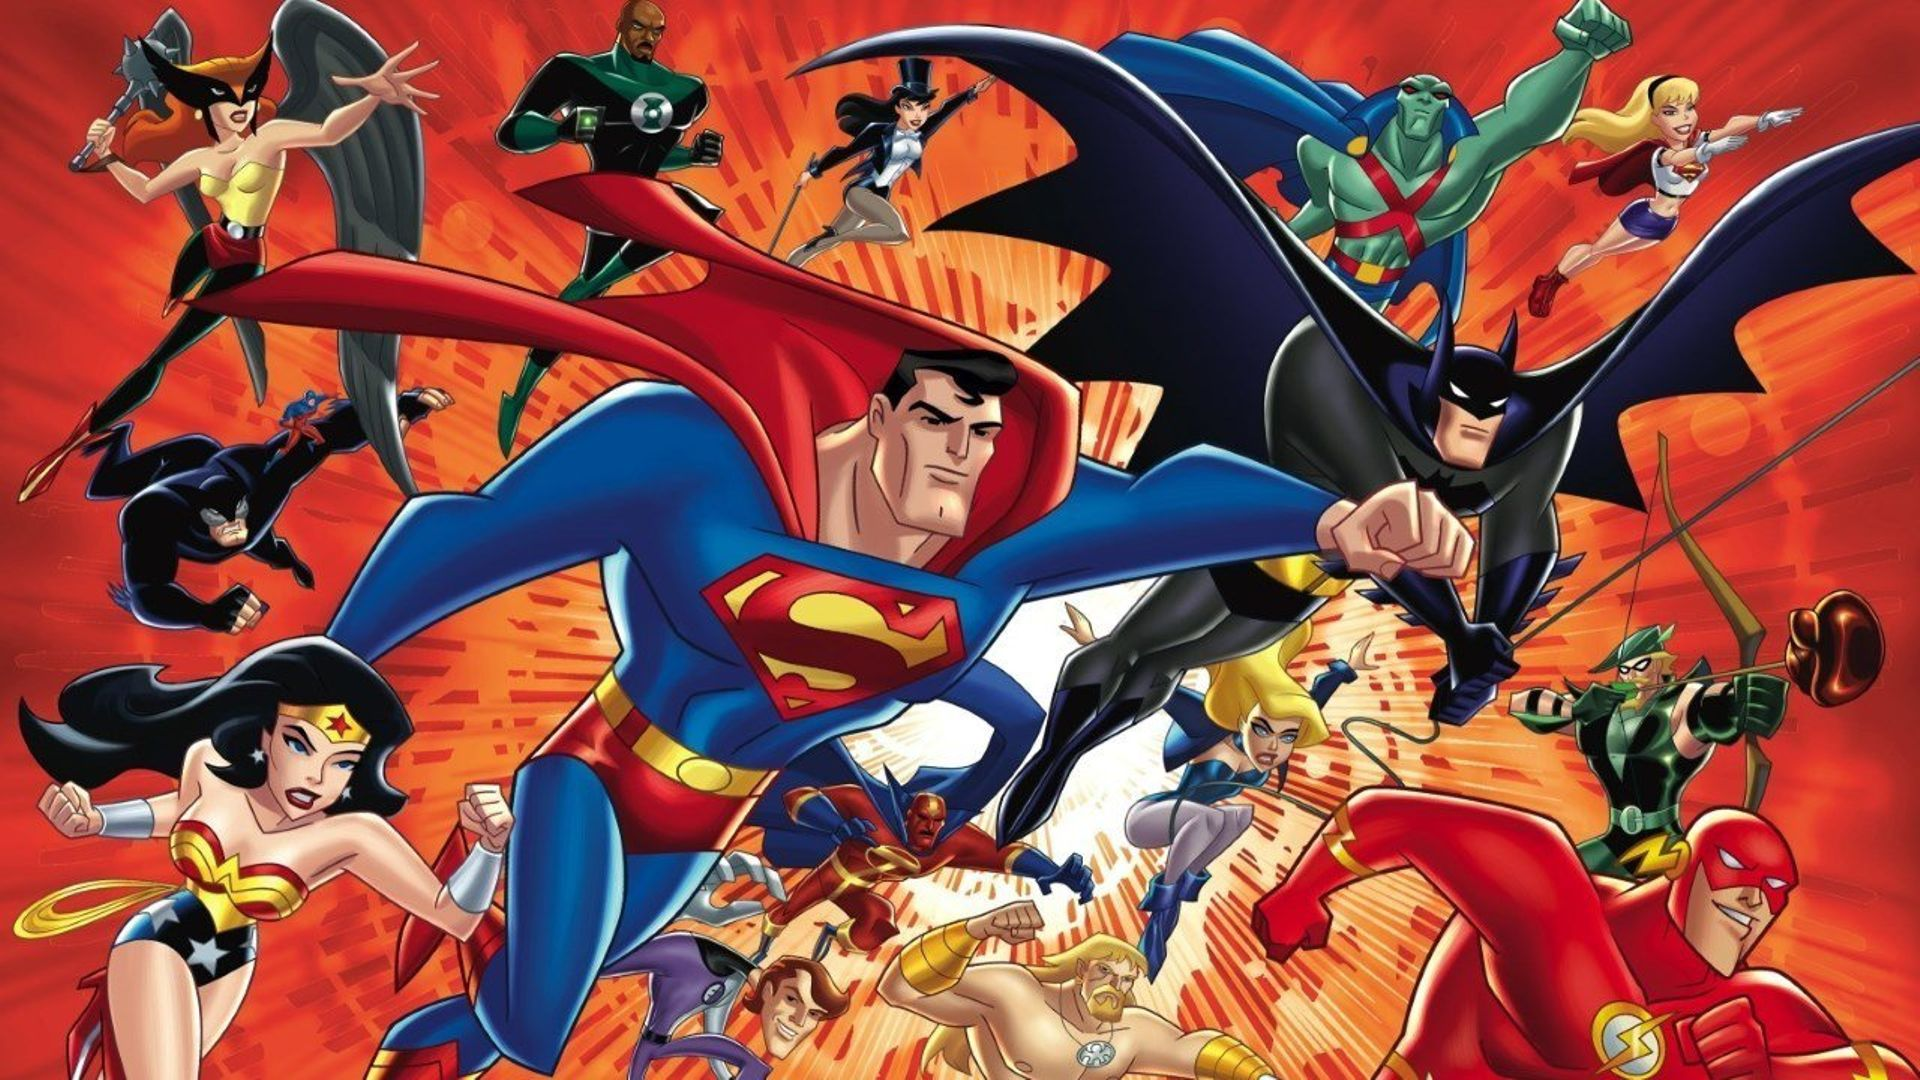 Justice League/Justice League Unlimited